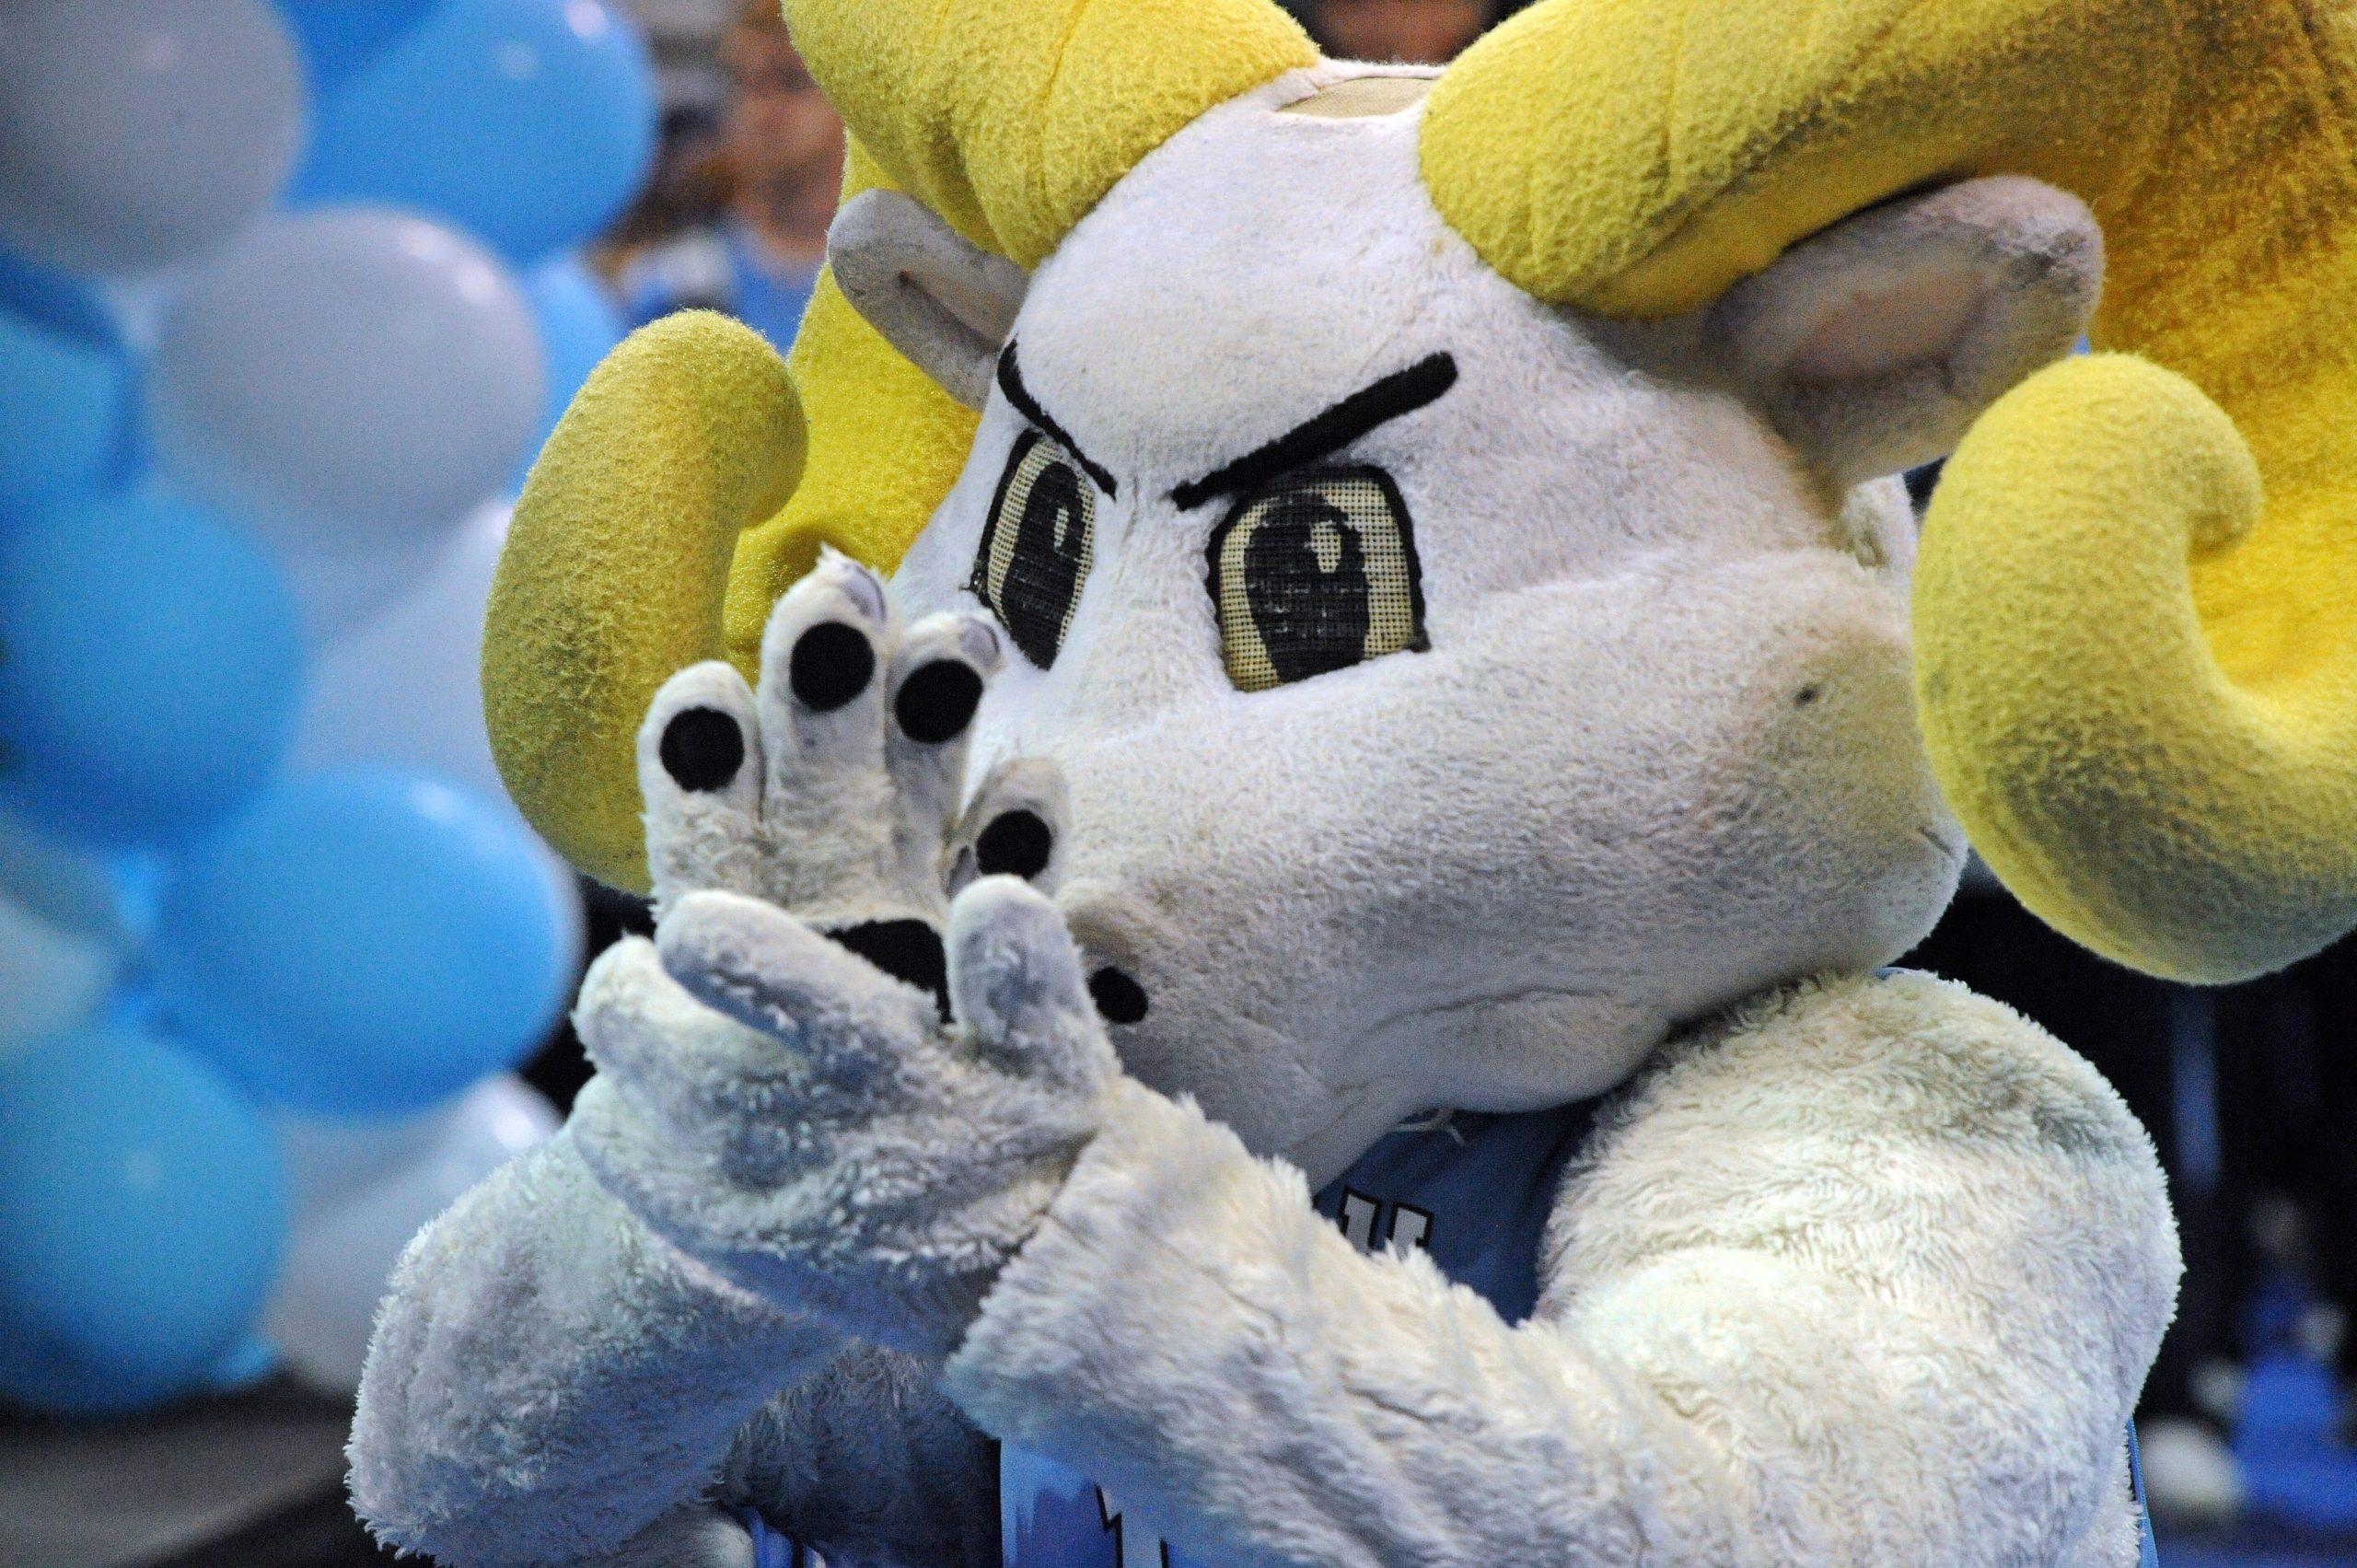 Rameses mascot clapping.